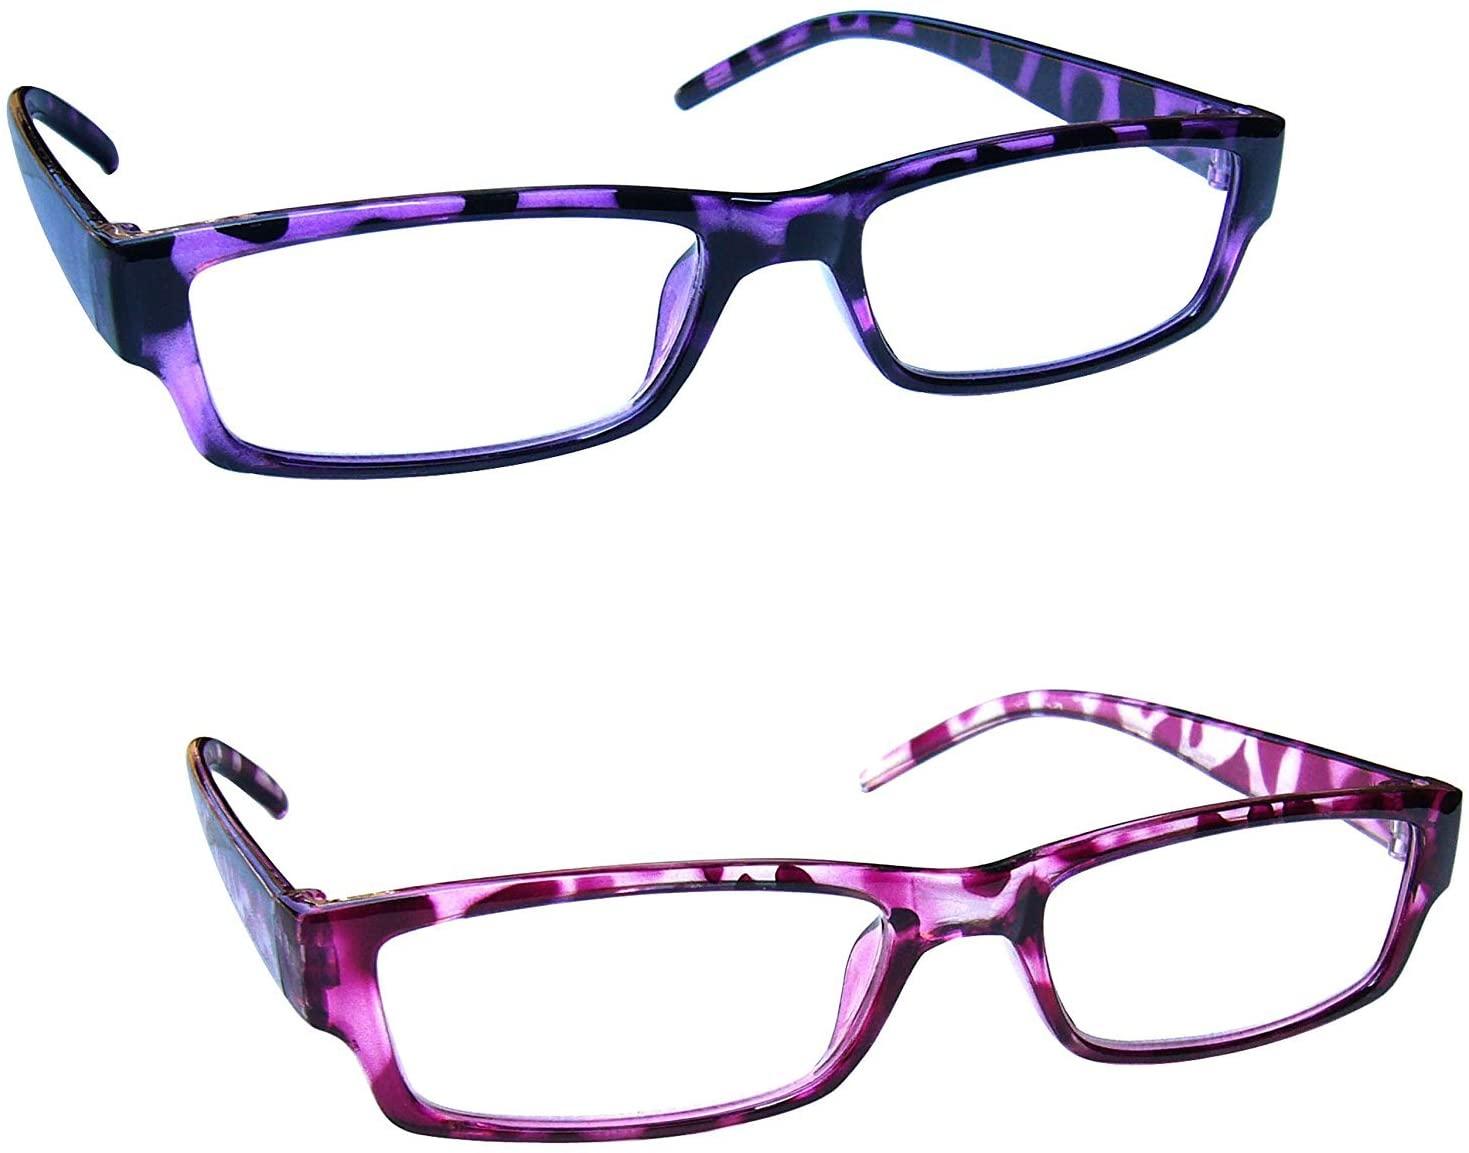 The Reading Glasses Company Purple & Pink Tortoiseshell Lightweight Readers Value 2 Pack Mens Womens RR32-54 +3.00